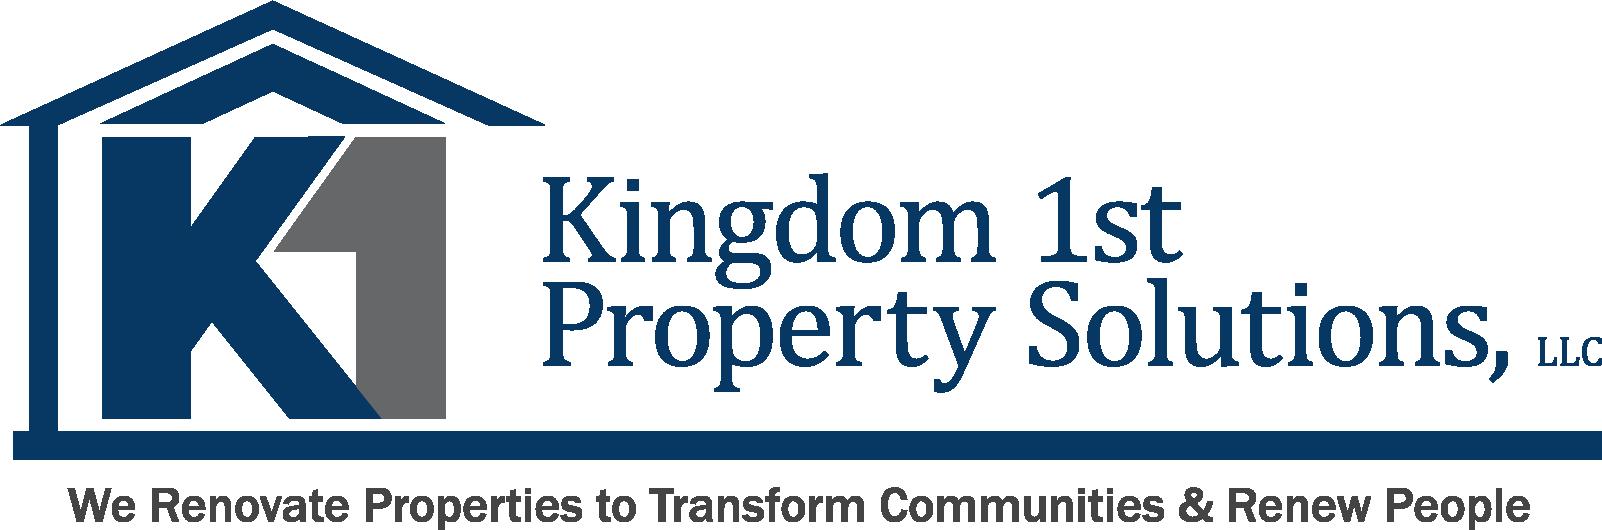 Kingdom 1st Property Solutions